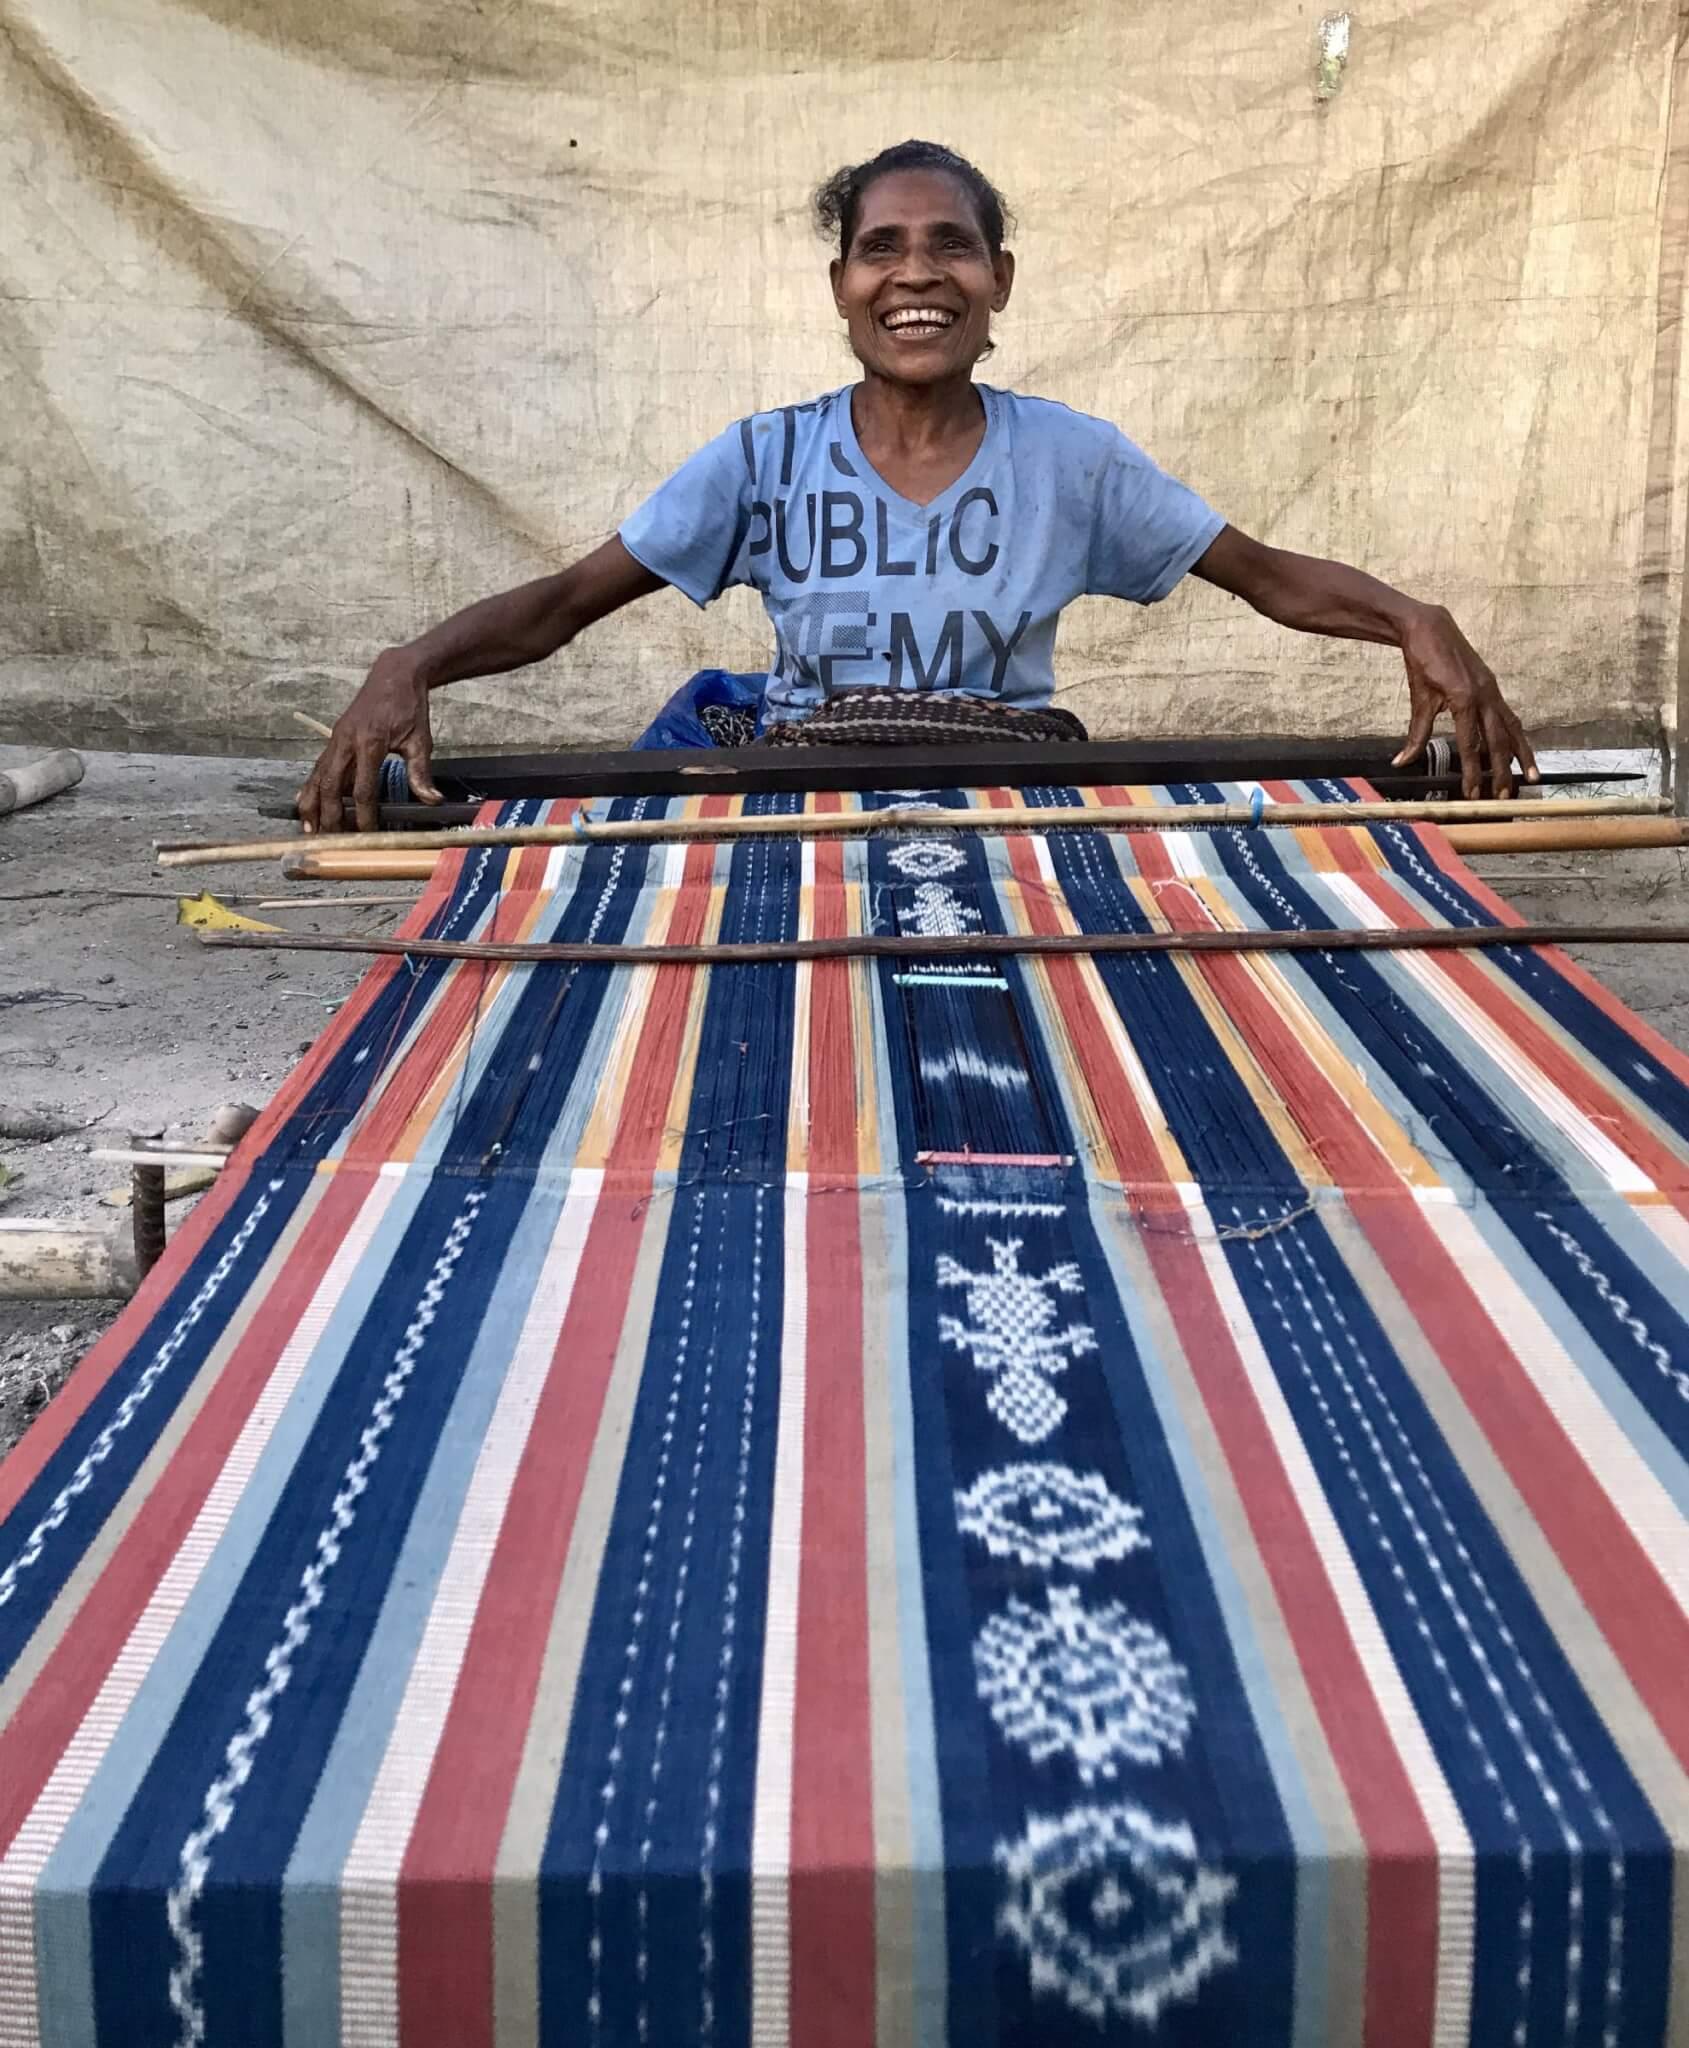 Threads of Life所有布料都是由織布女工在家完成,這樣能夠賺錢之餘,亦能照顧家裏的小孩。